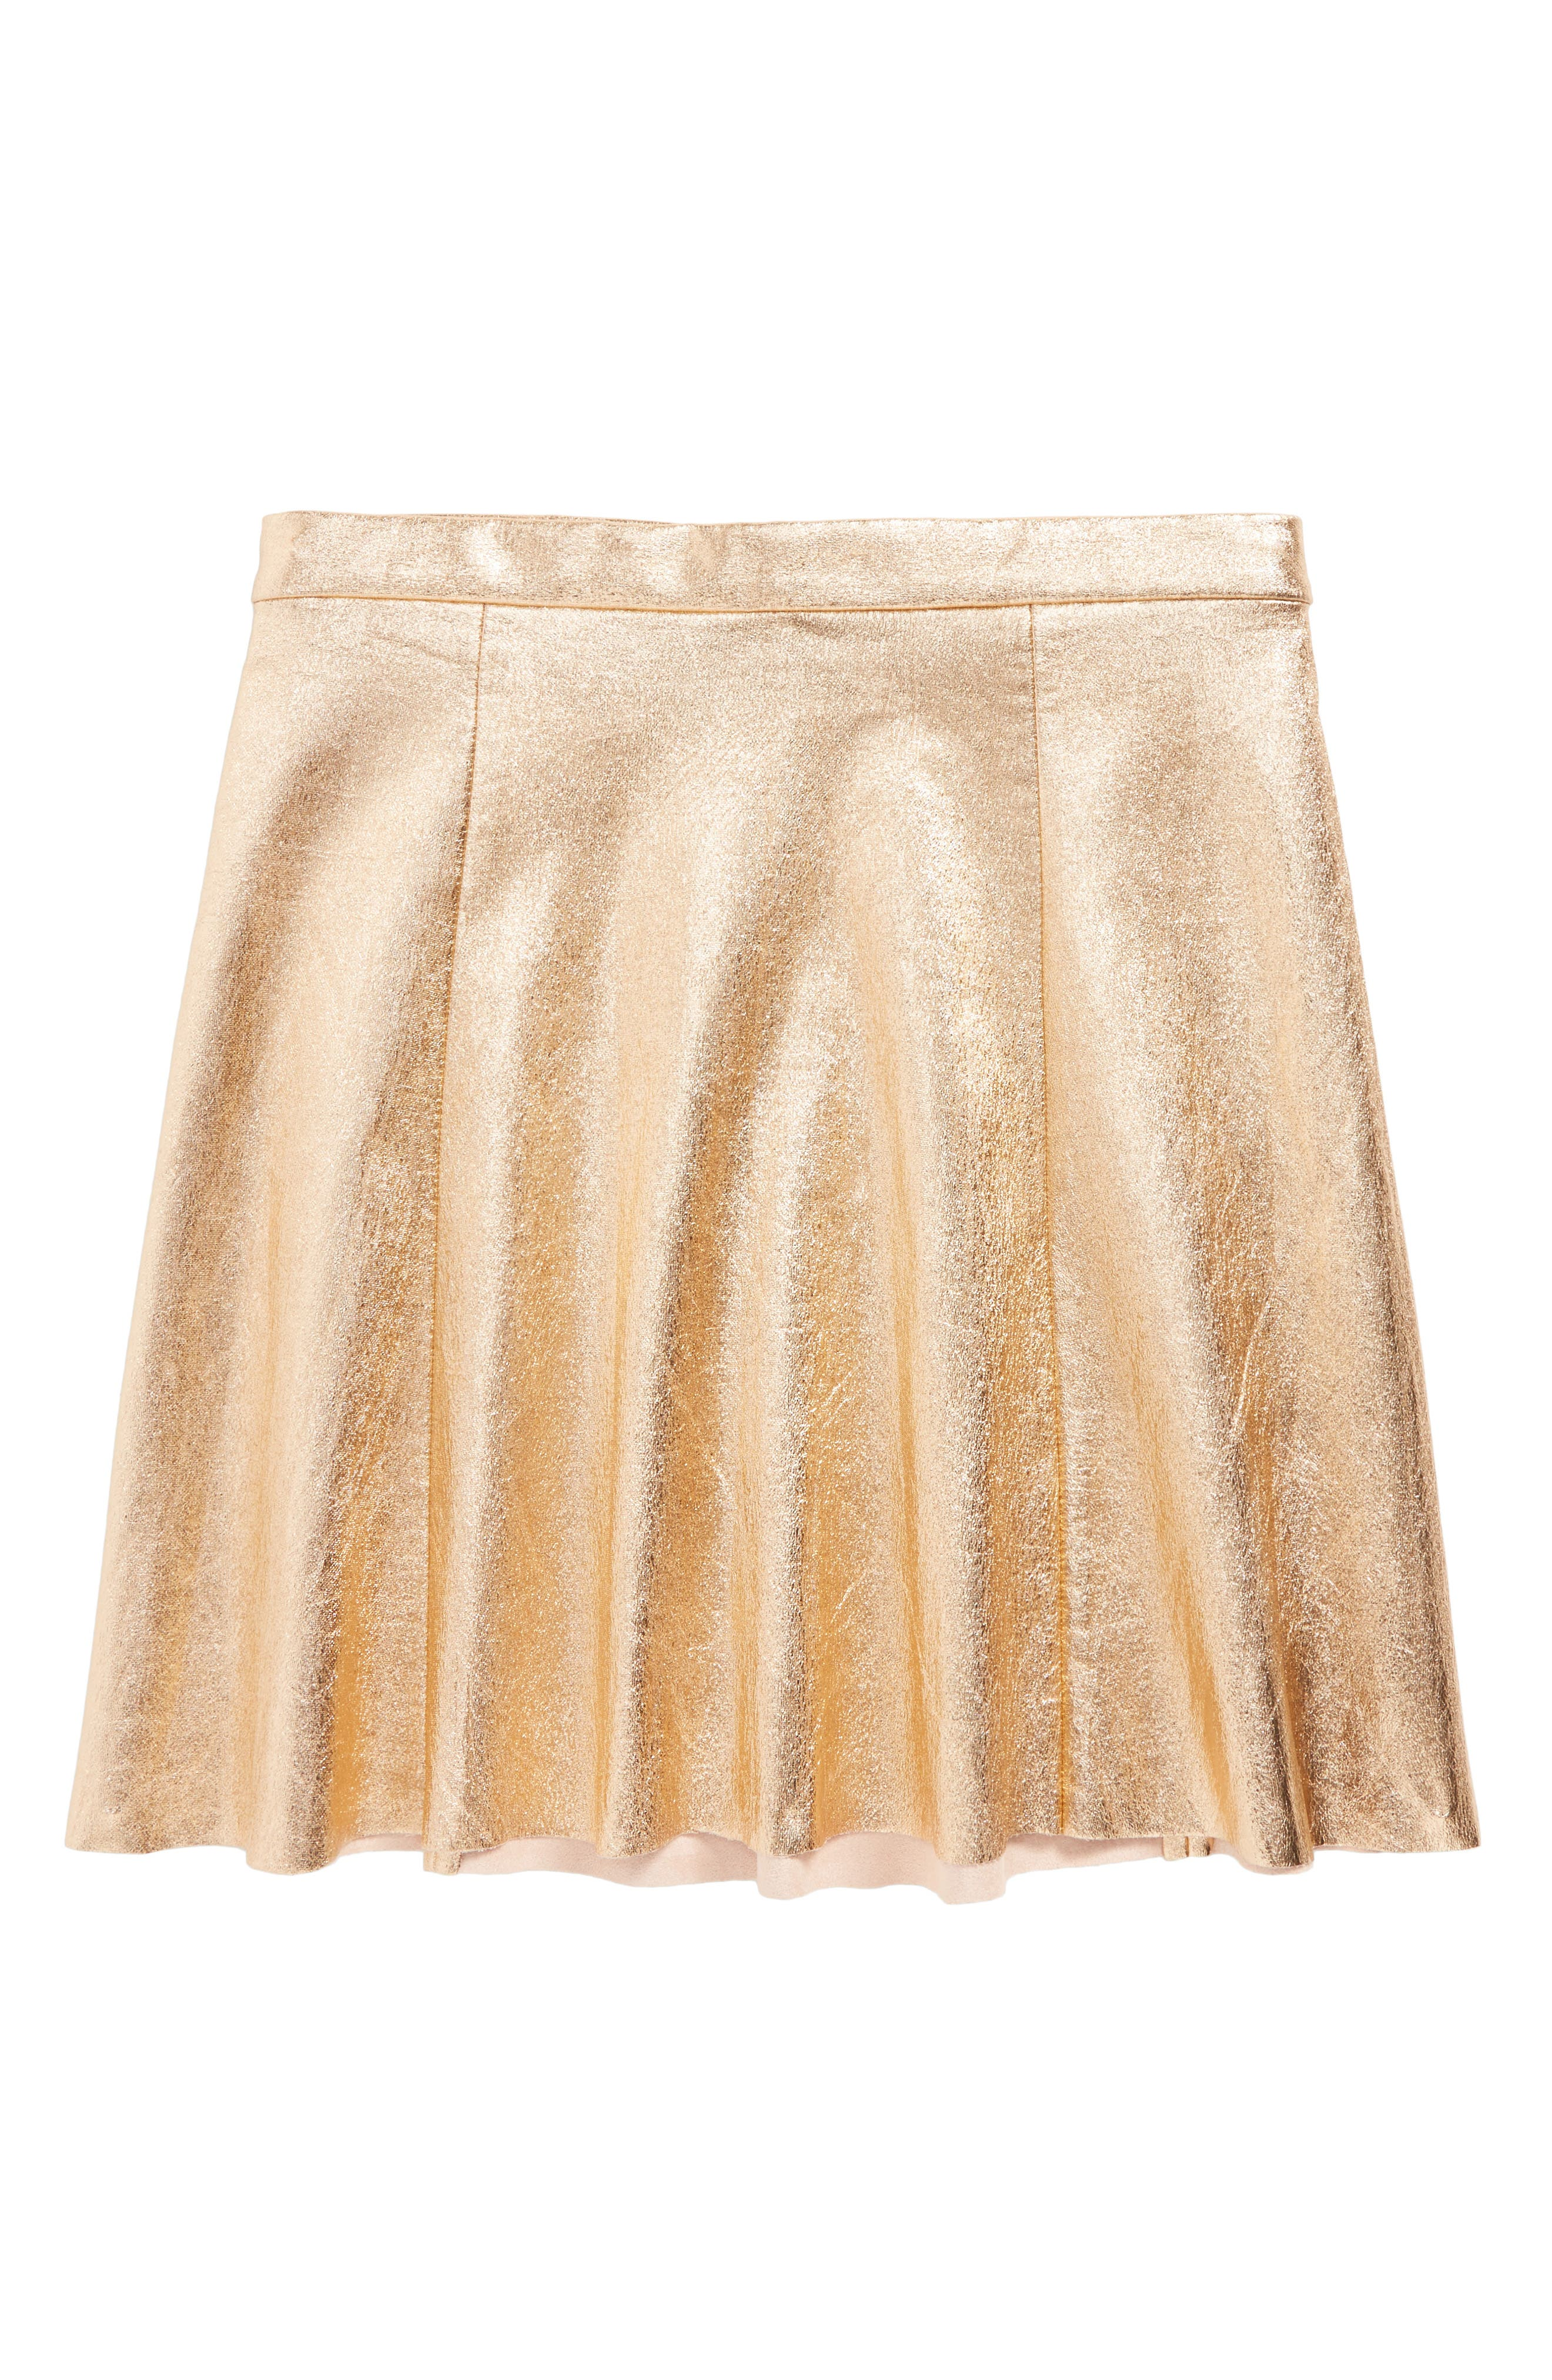 metallic skirt,                             Main thumbnail 1, color,                             650